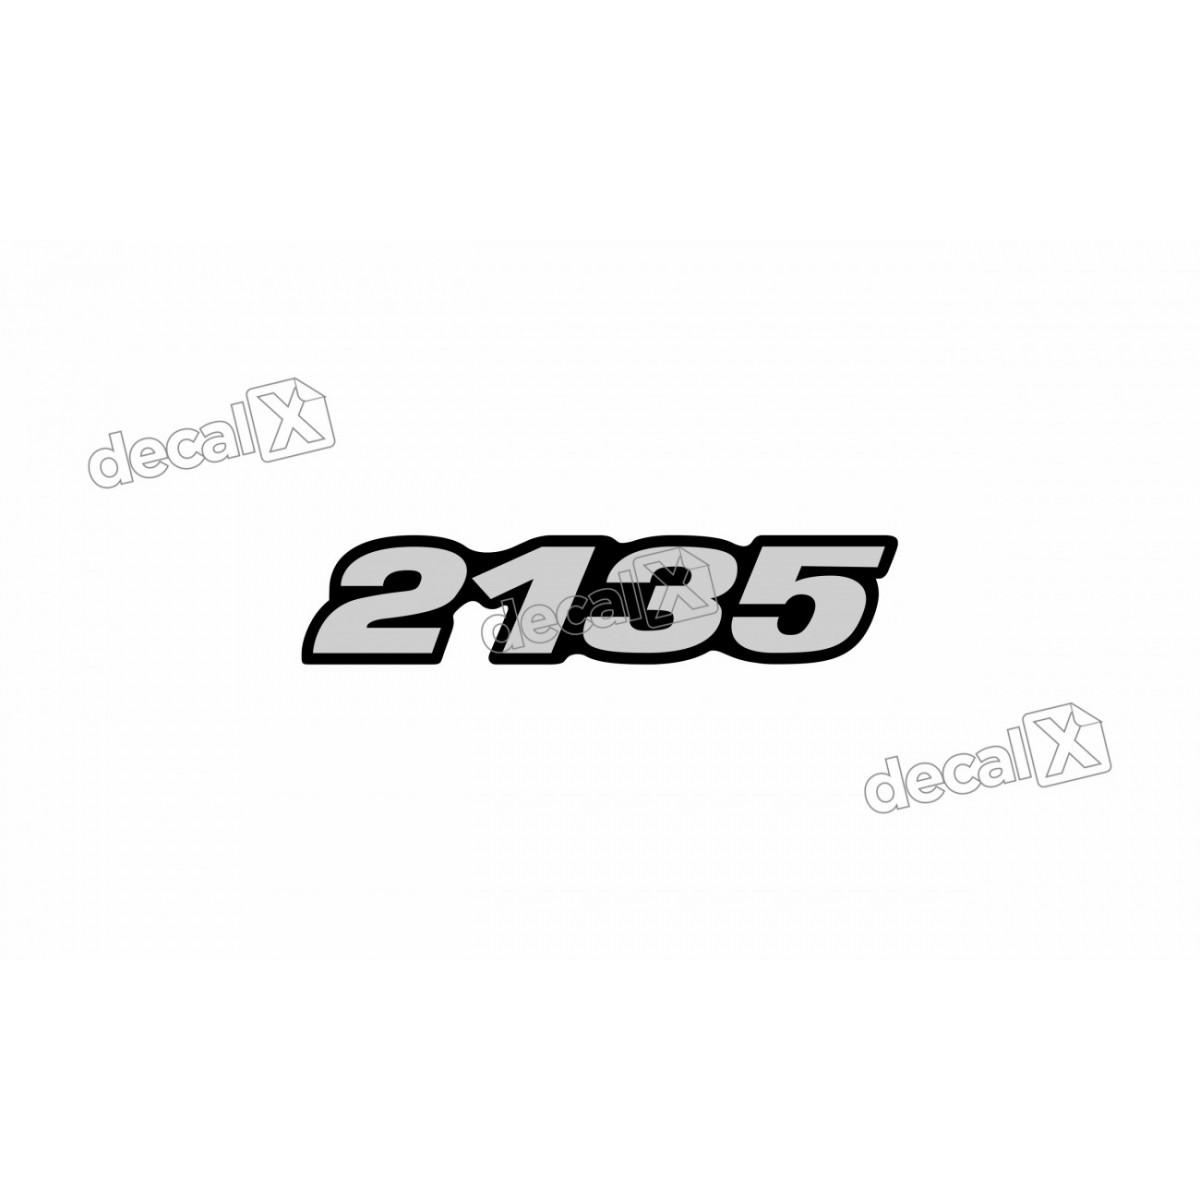 Adesivo Emblema Resinado Mercedes 2135 Cm76 Decalx